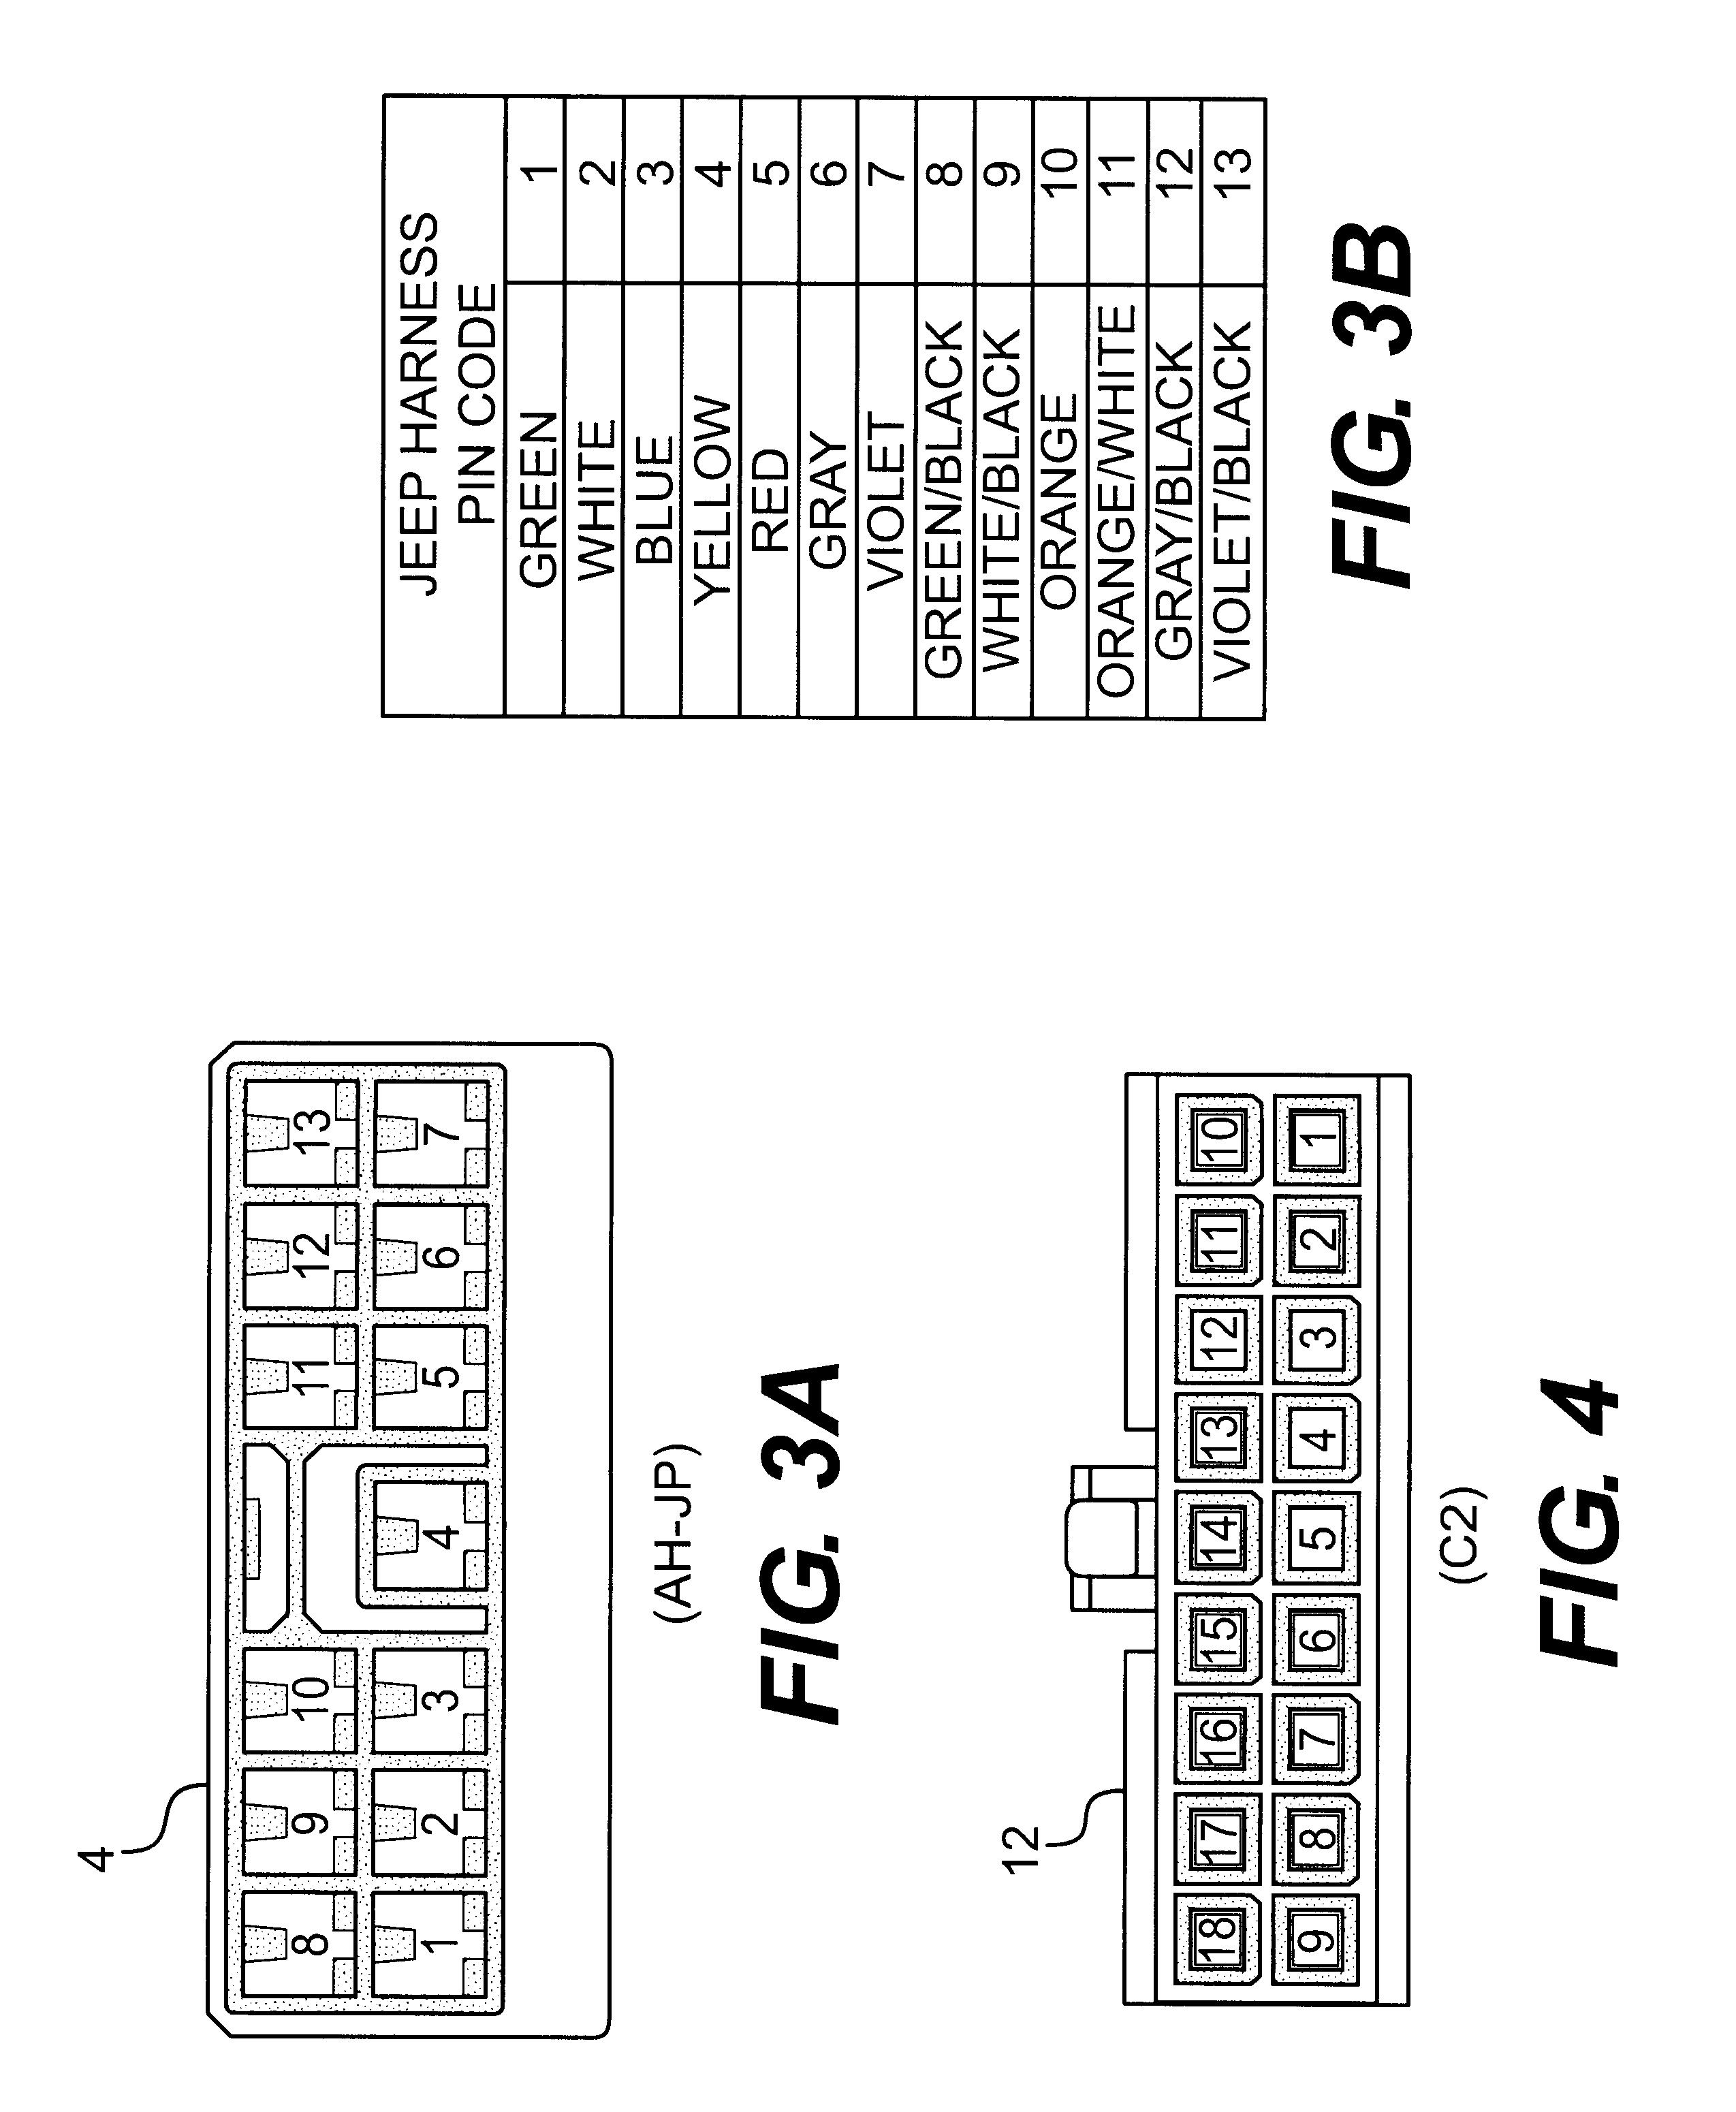 Fd5000 Wiring Diagram